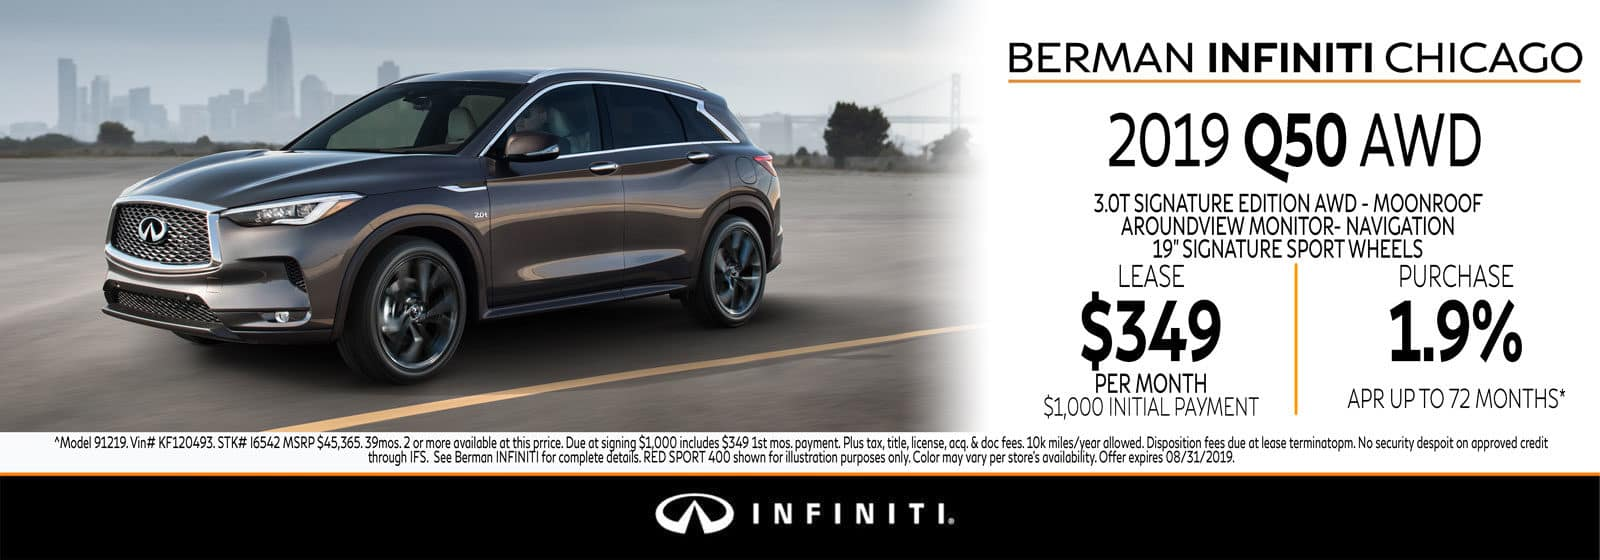 New 2019 INFINITI QX50 August offer at Berman INFINITI Chicago!